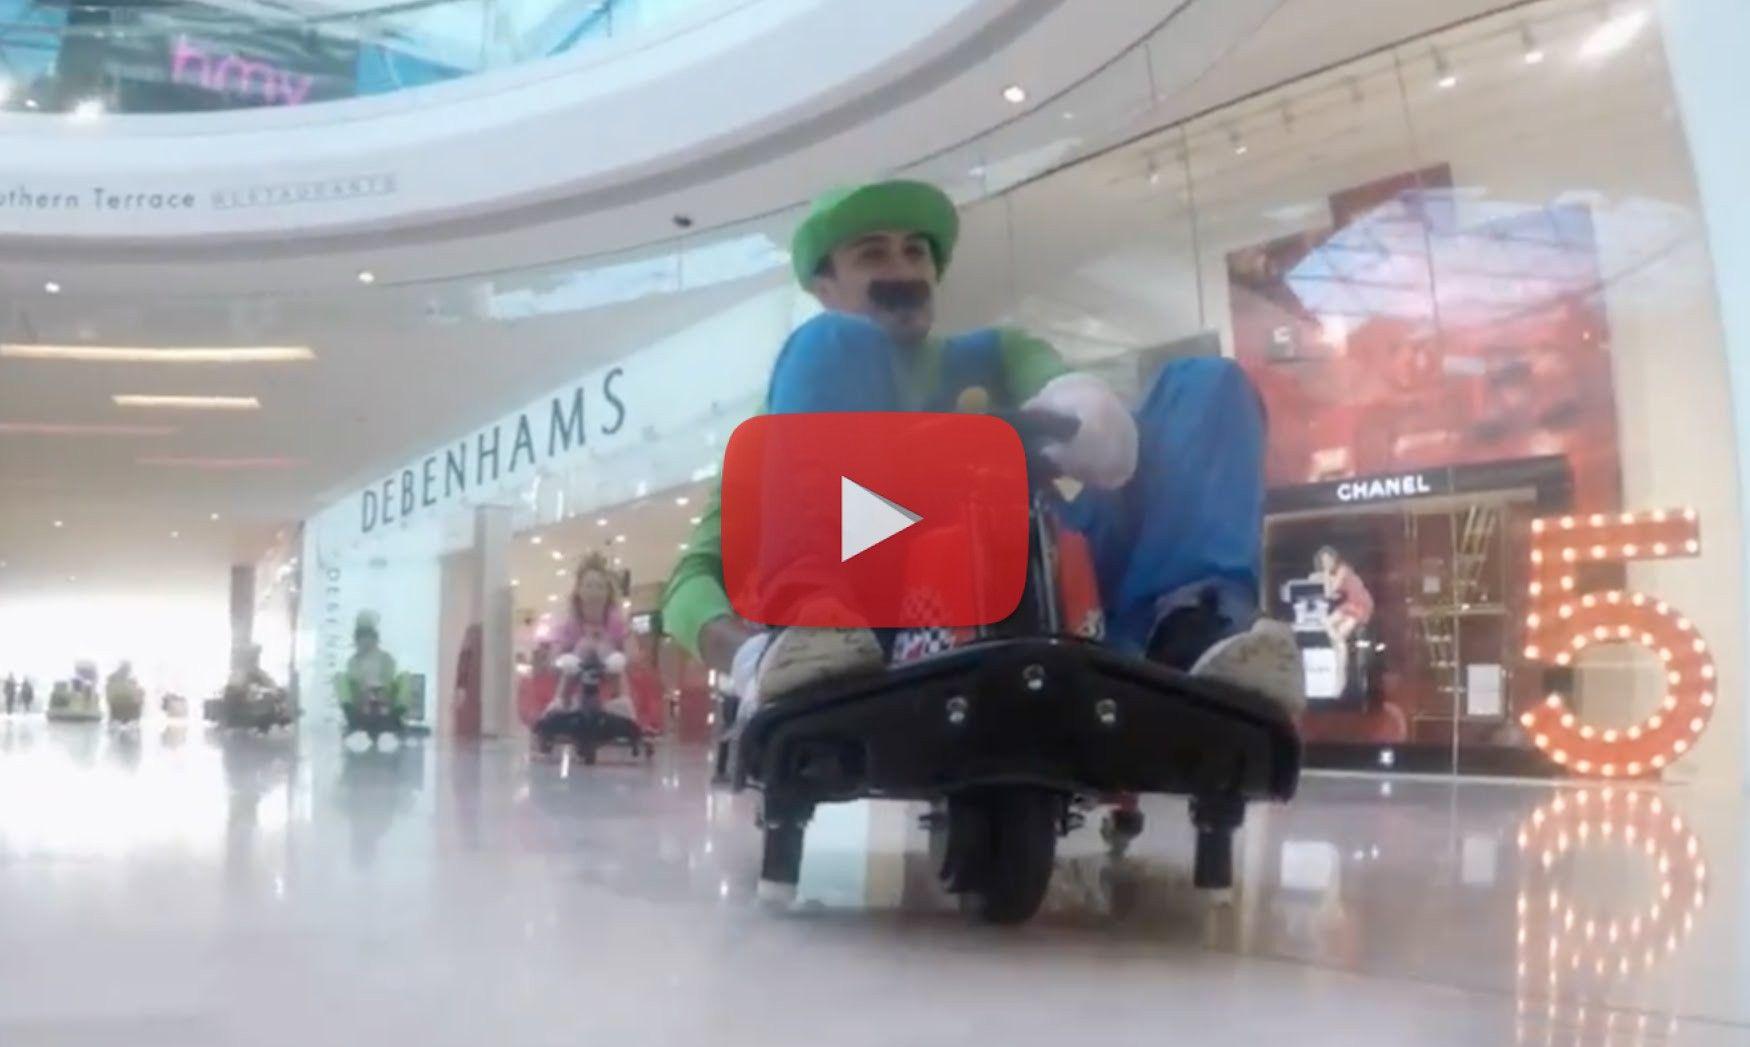 Mario Kart FlashMob - Watch here: http://laughdaily.net/funny/mario-kart-flashmob/